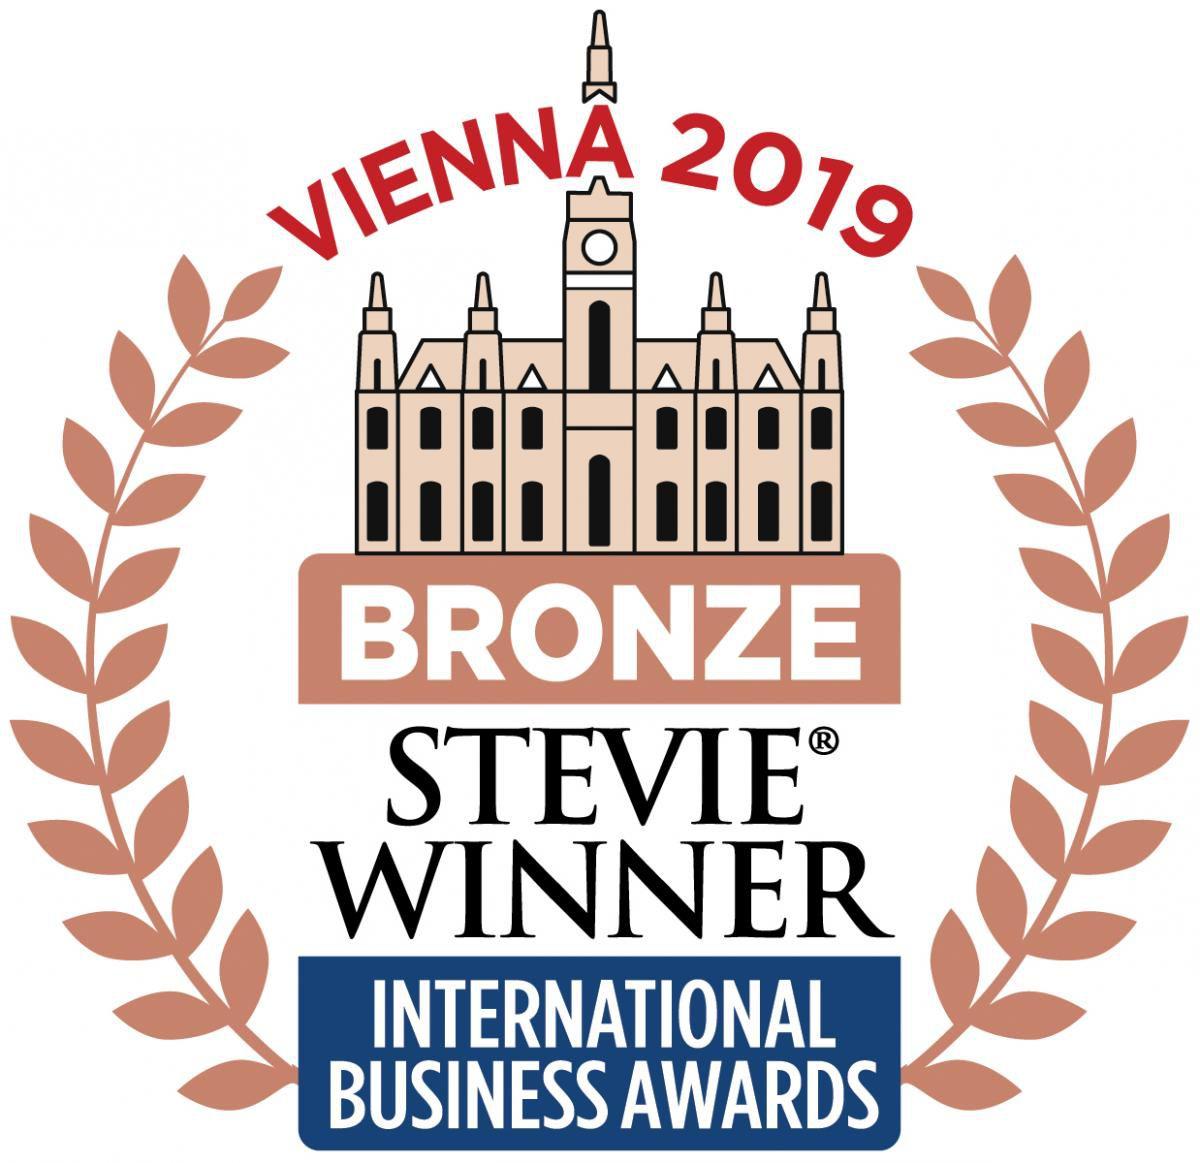 2019 Bronze Stevie Winner International Business Awards